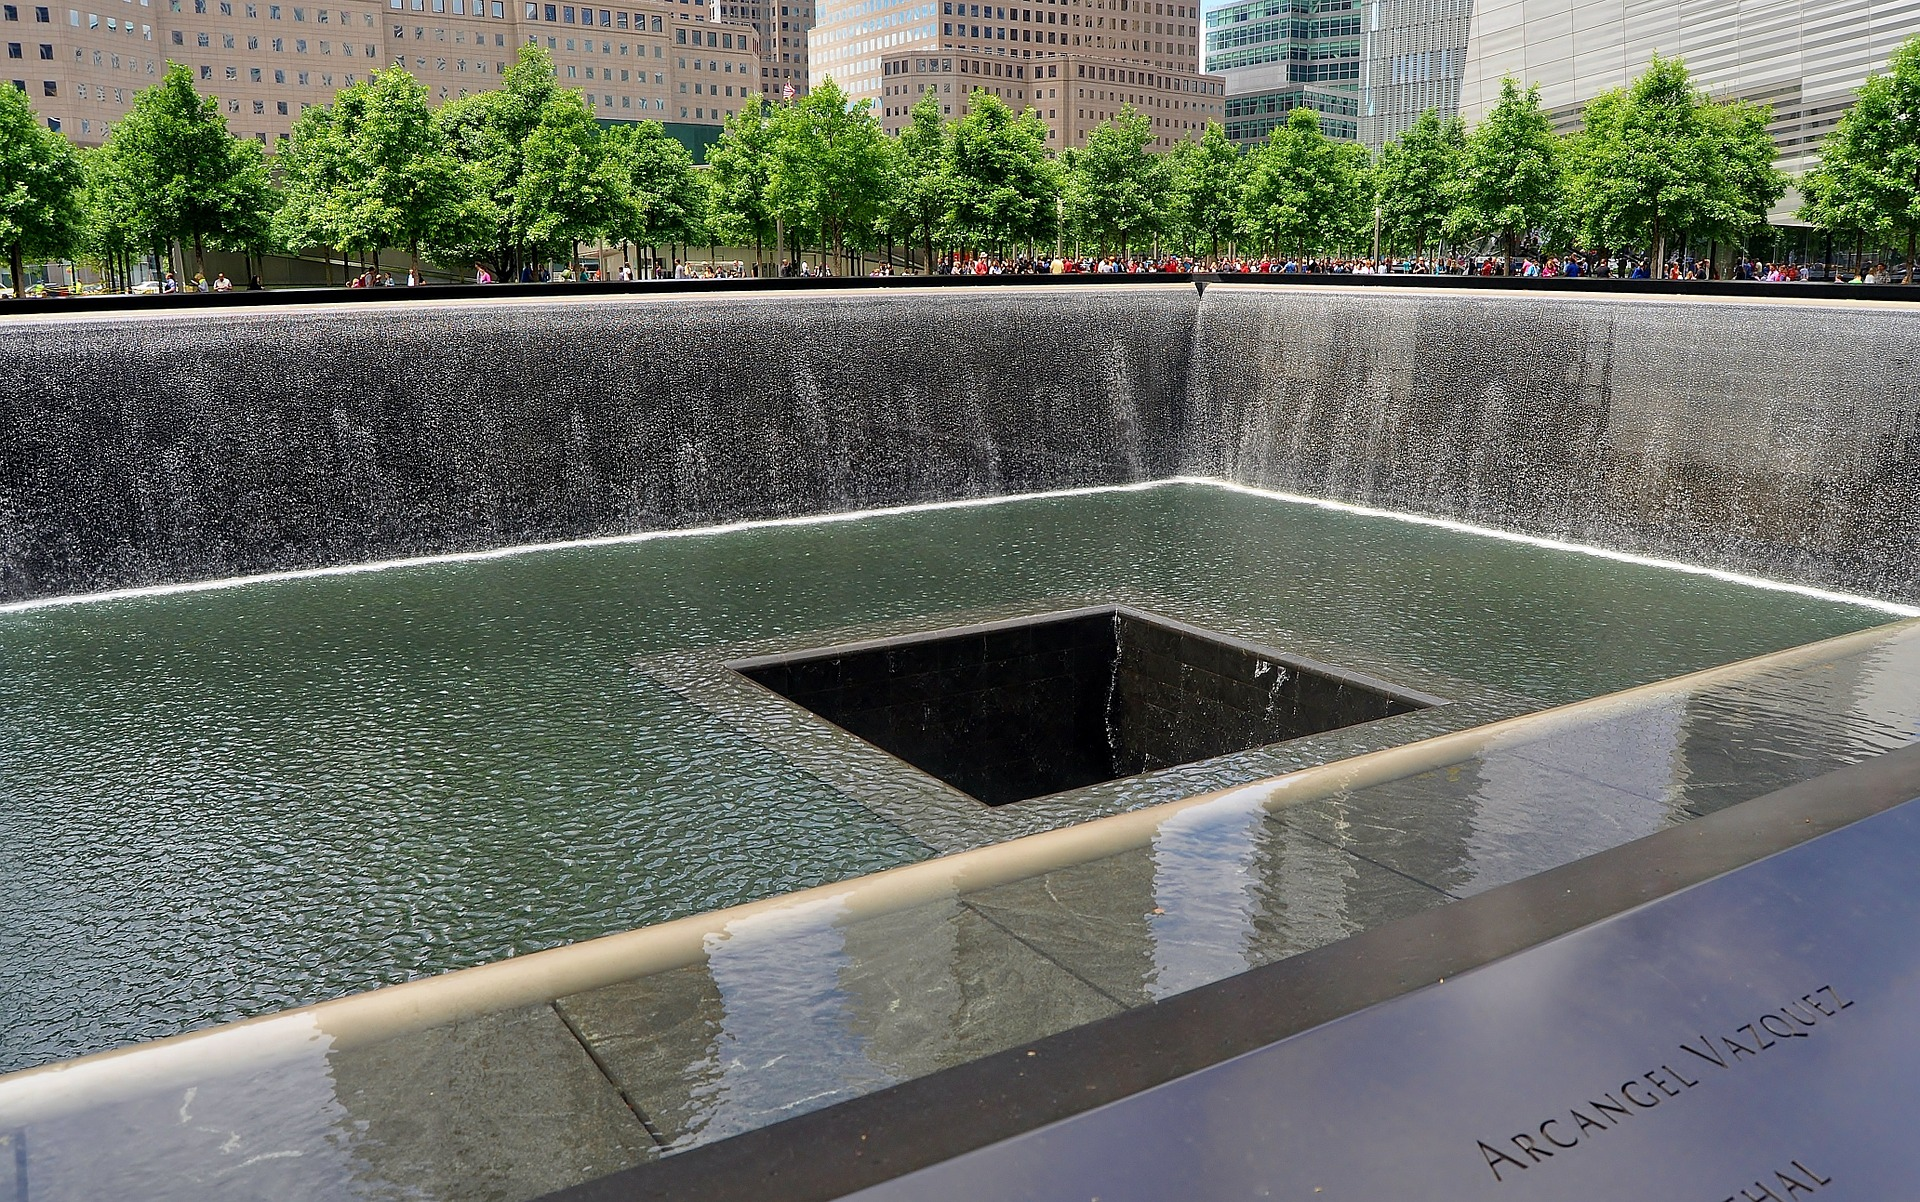 Ground Zero, National September 11 Memorial, New York City